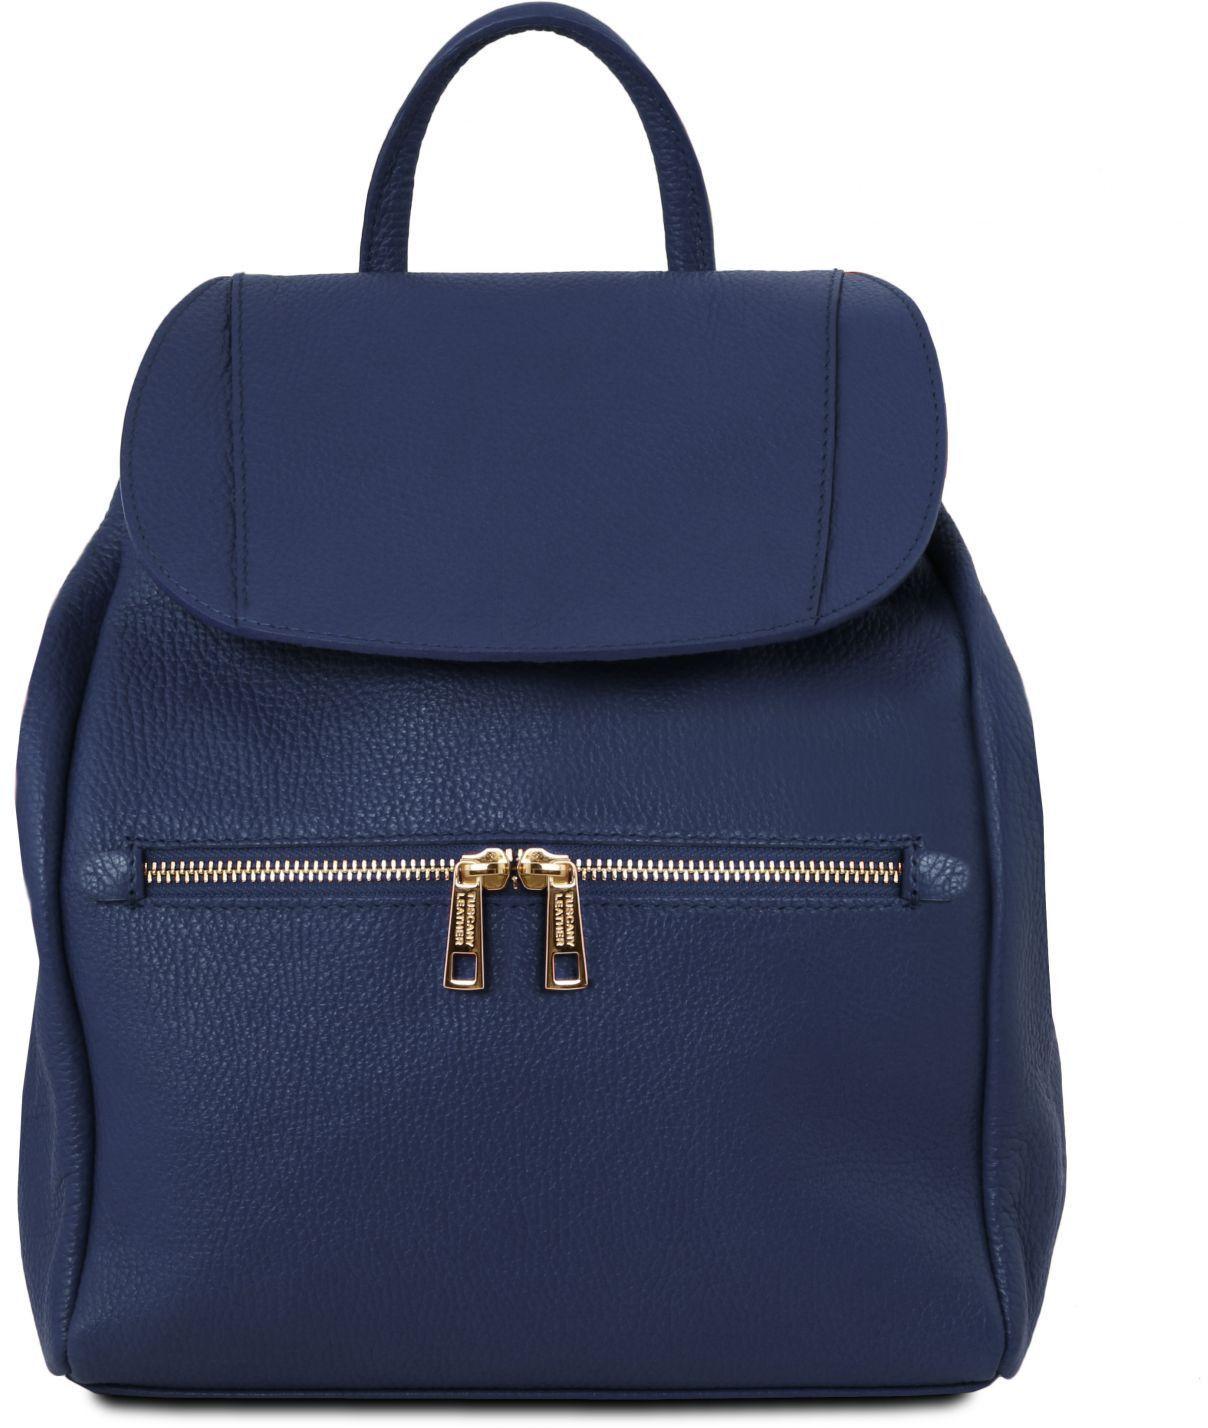 e3604bfaed Γυναικεία Τσάντα Πλάτης Δερμάτινη TL141697 Μπλε σκούρο Tuscany Leather ...